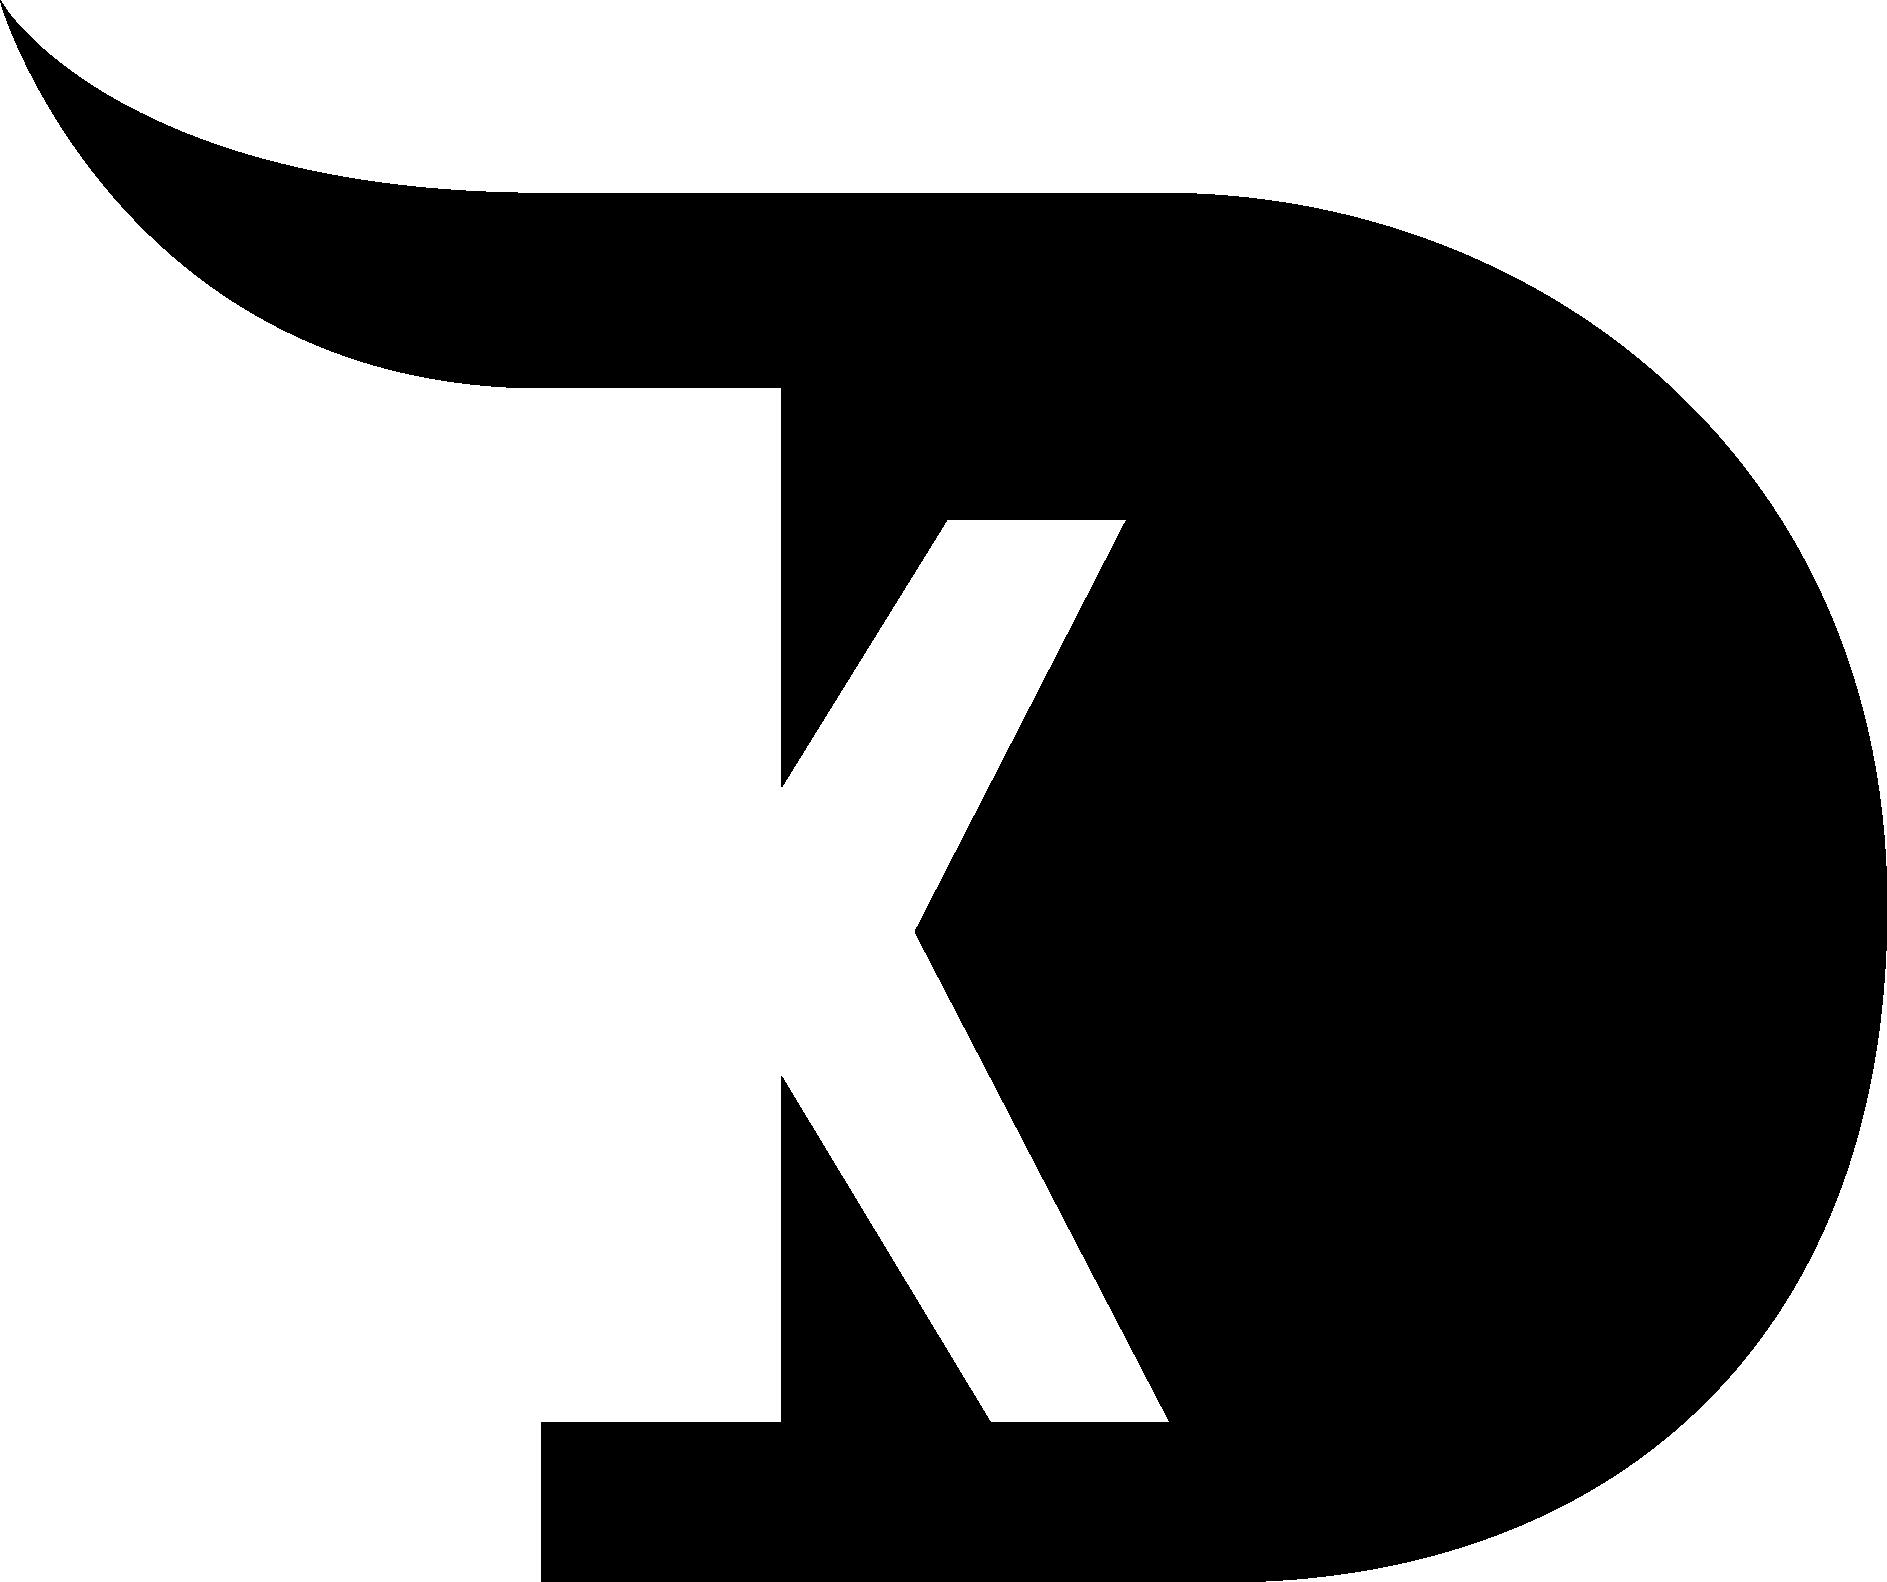 Destiny logo clipart jpg stock Destiny Klan   Brands of the World™   Download vector logos and ... jpg stock